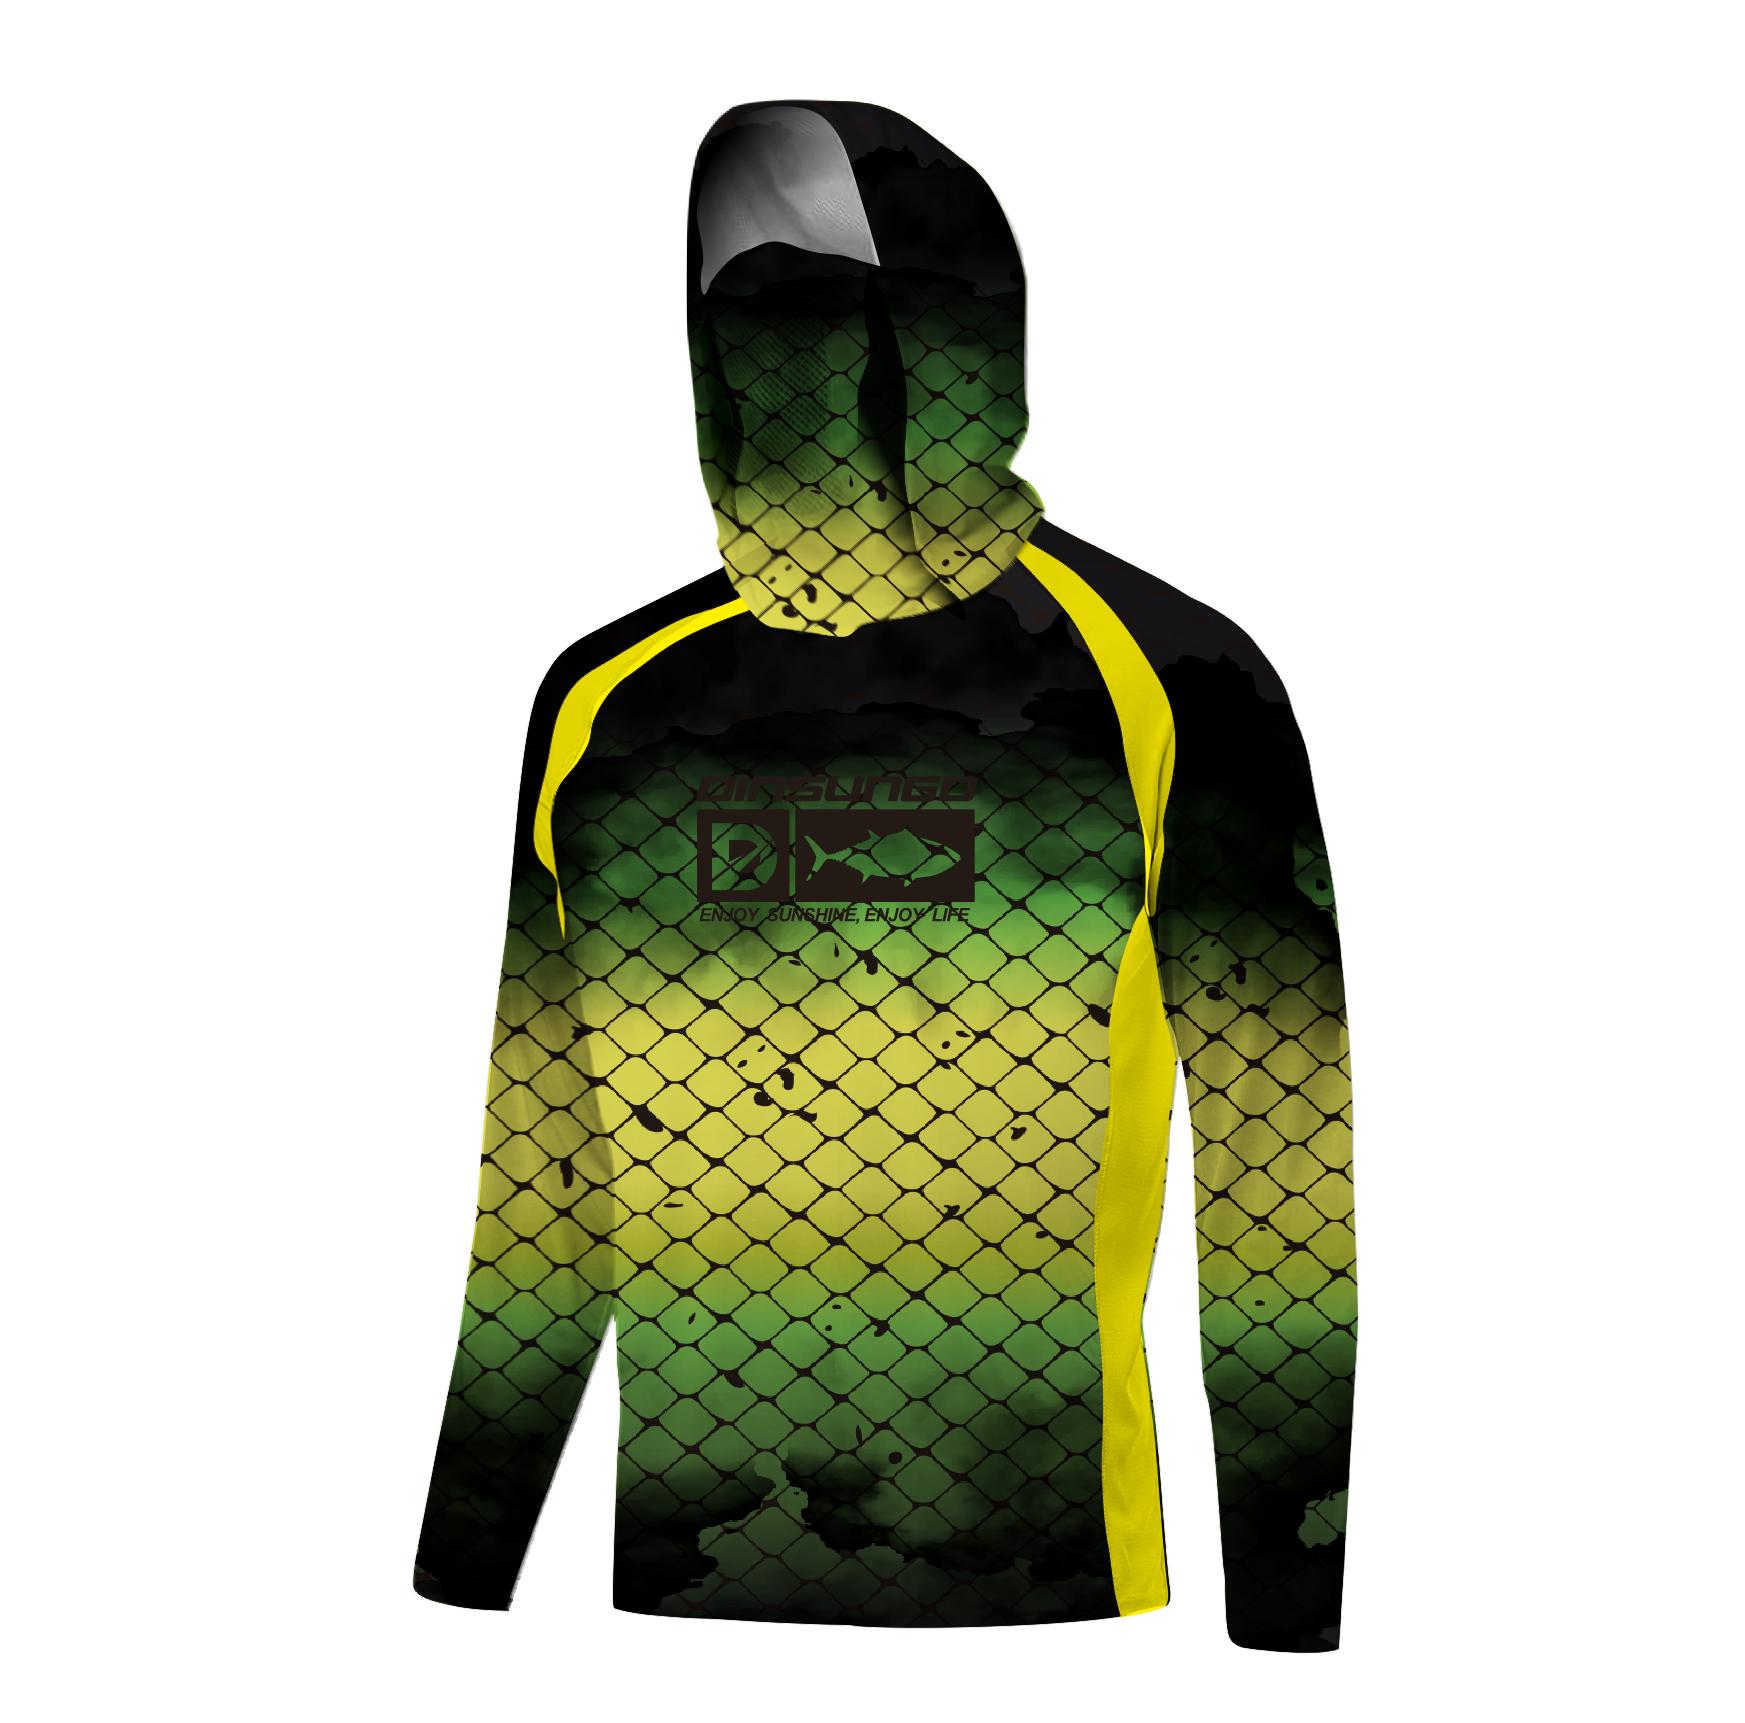 upf 50+ quick-drying breathable fishing shirts long-sleeved custom design mask hooded fishing hoodie